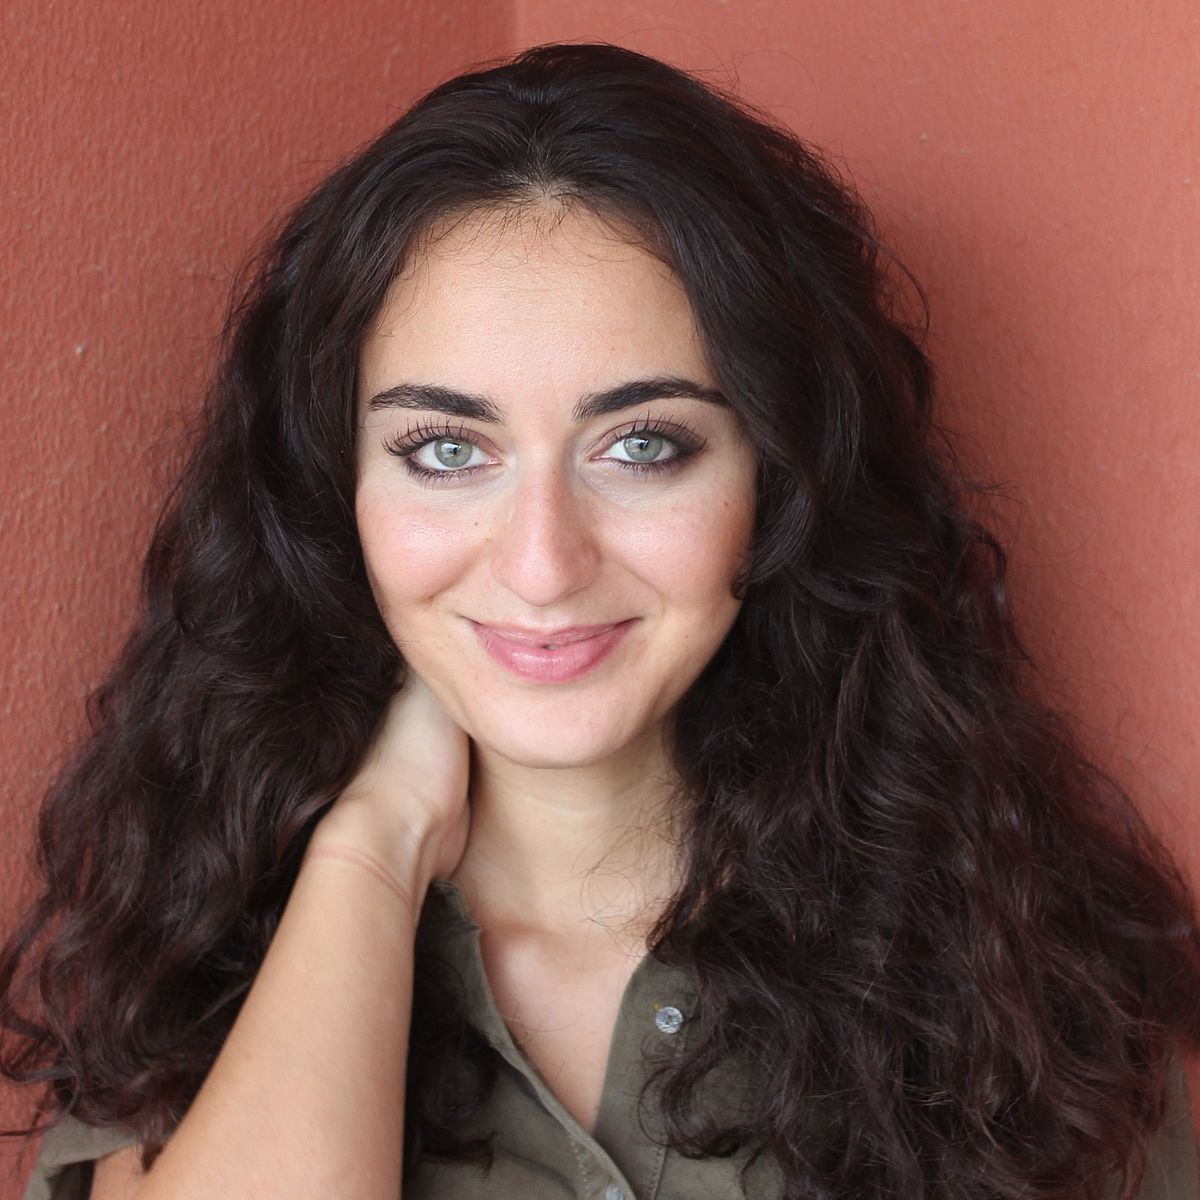 بالصور بنات لبنانية , اجمل بنات لبنان ممكن ان تراهم 3225 7